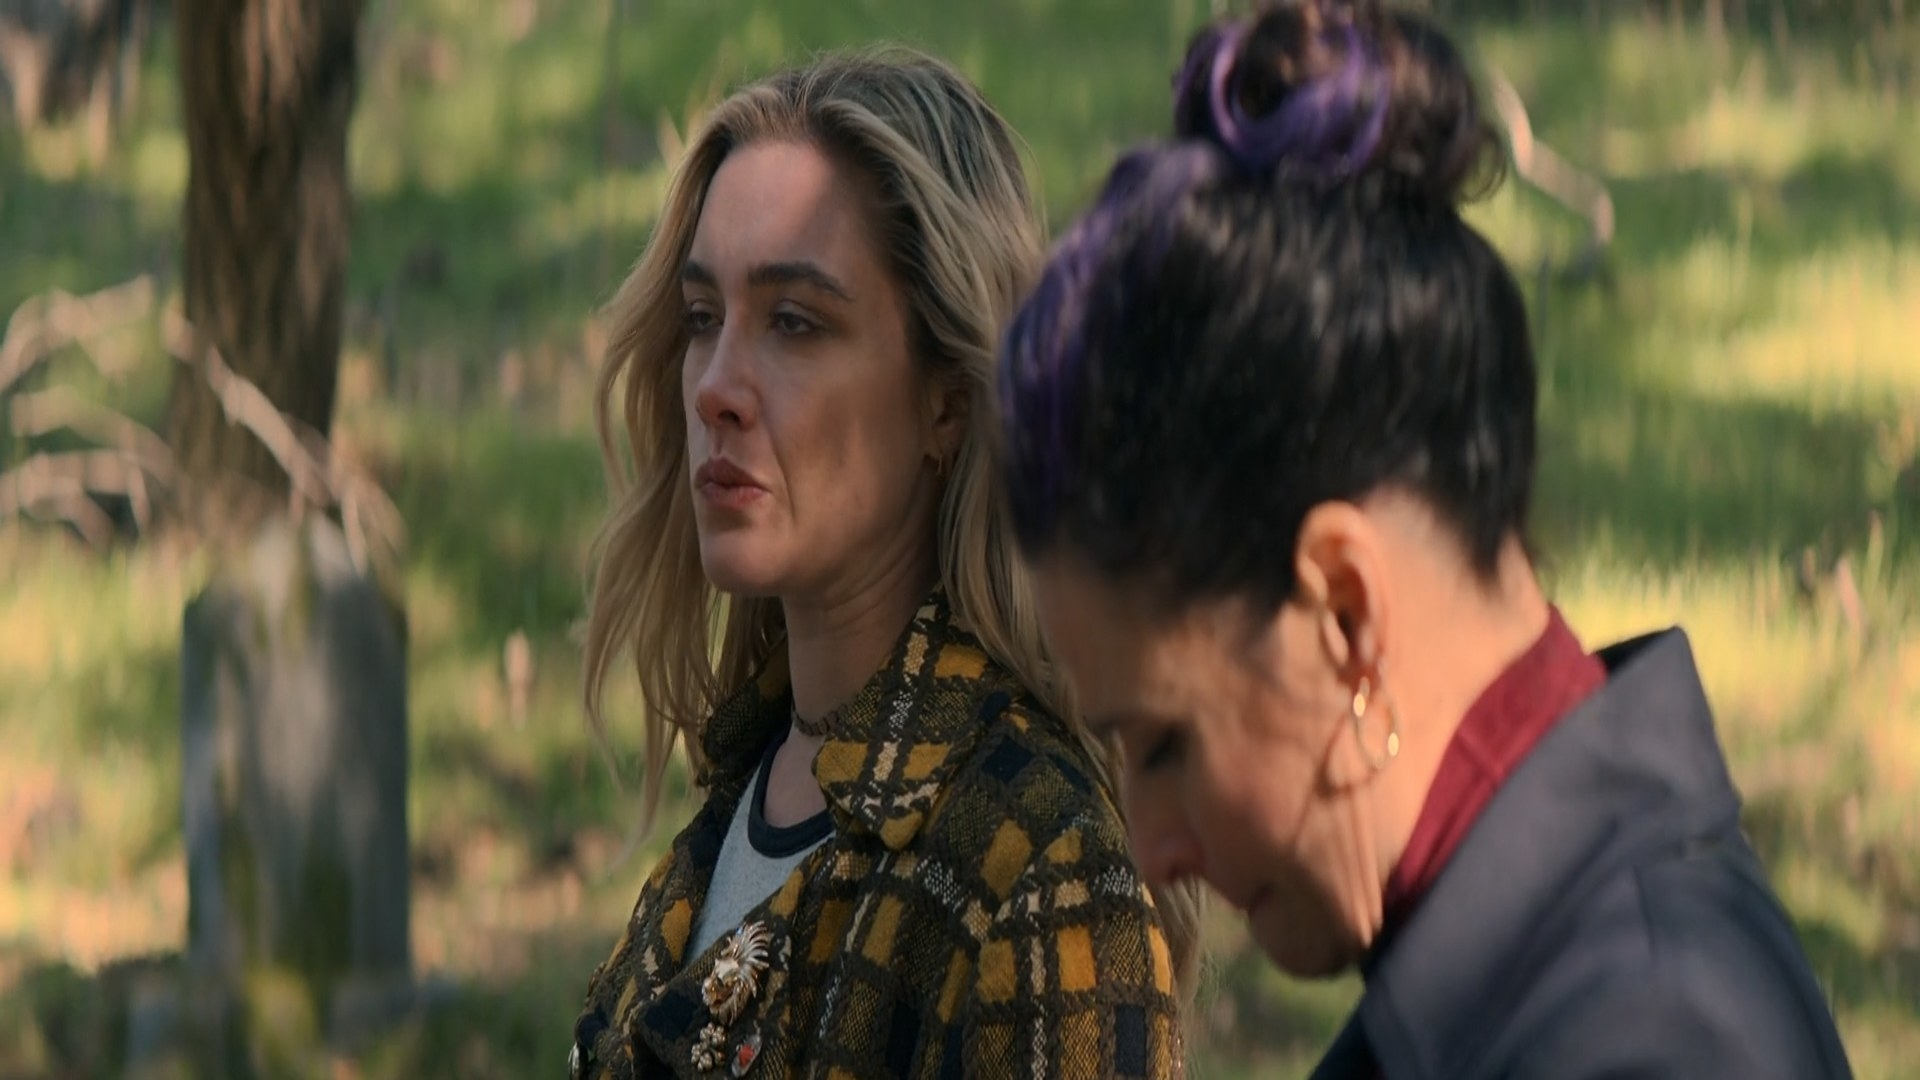 Two women standing in a graveyard.